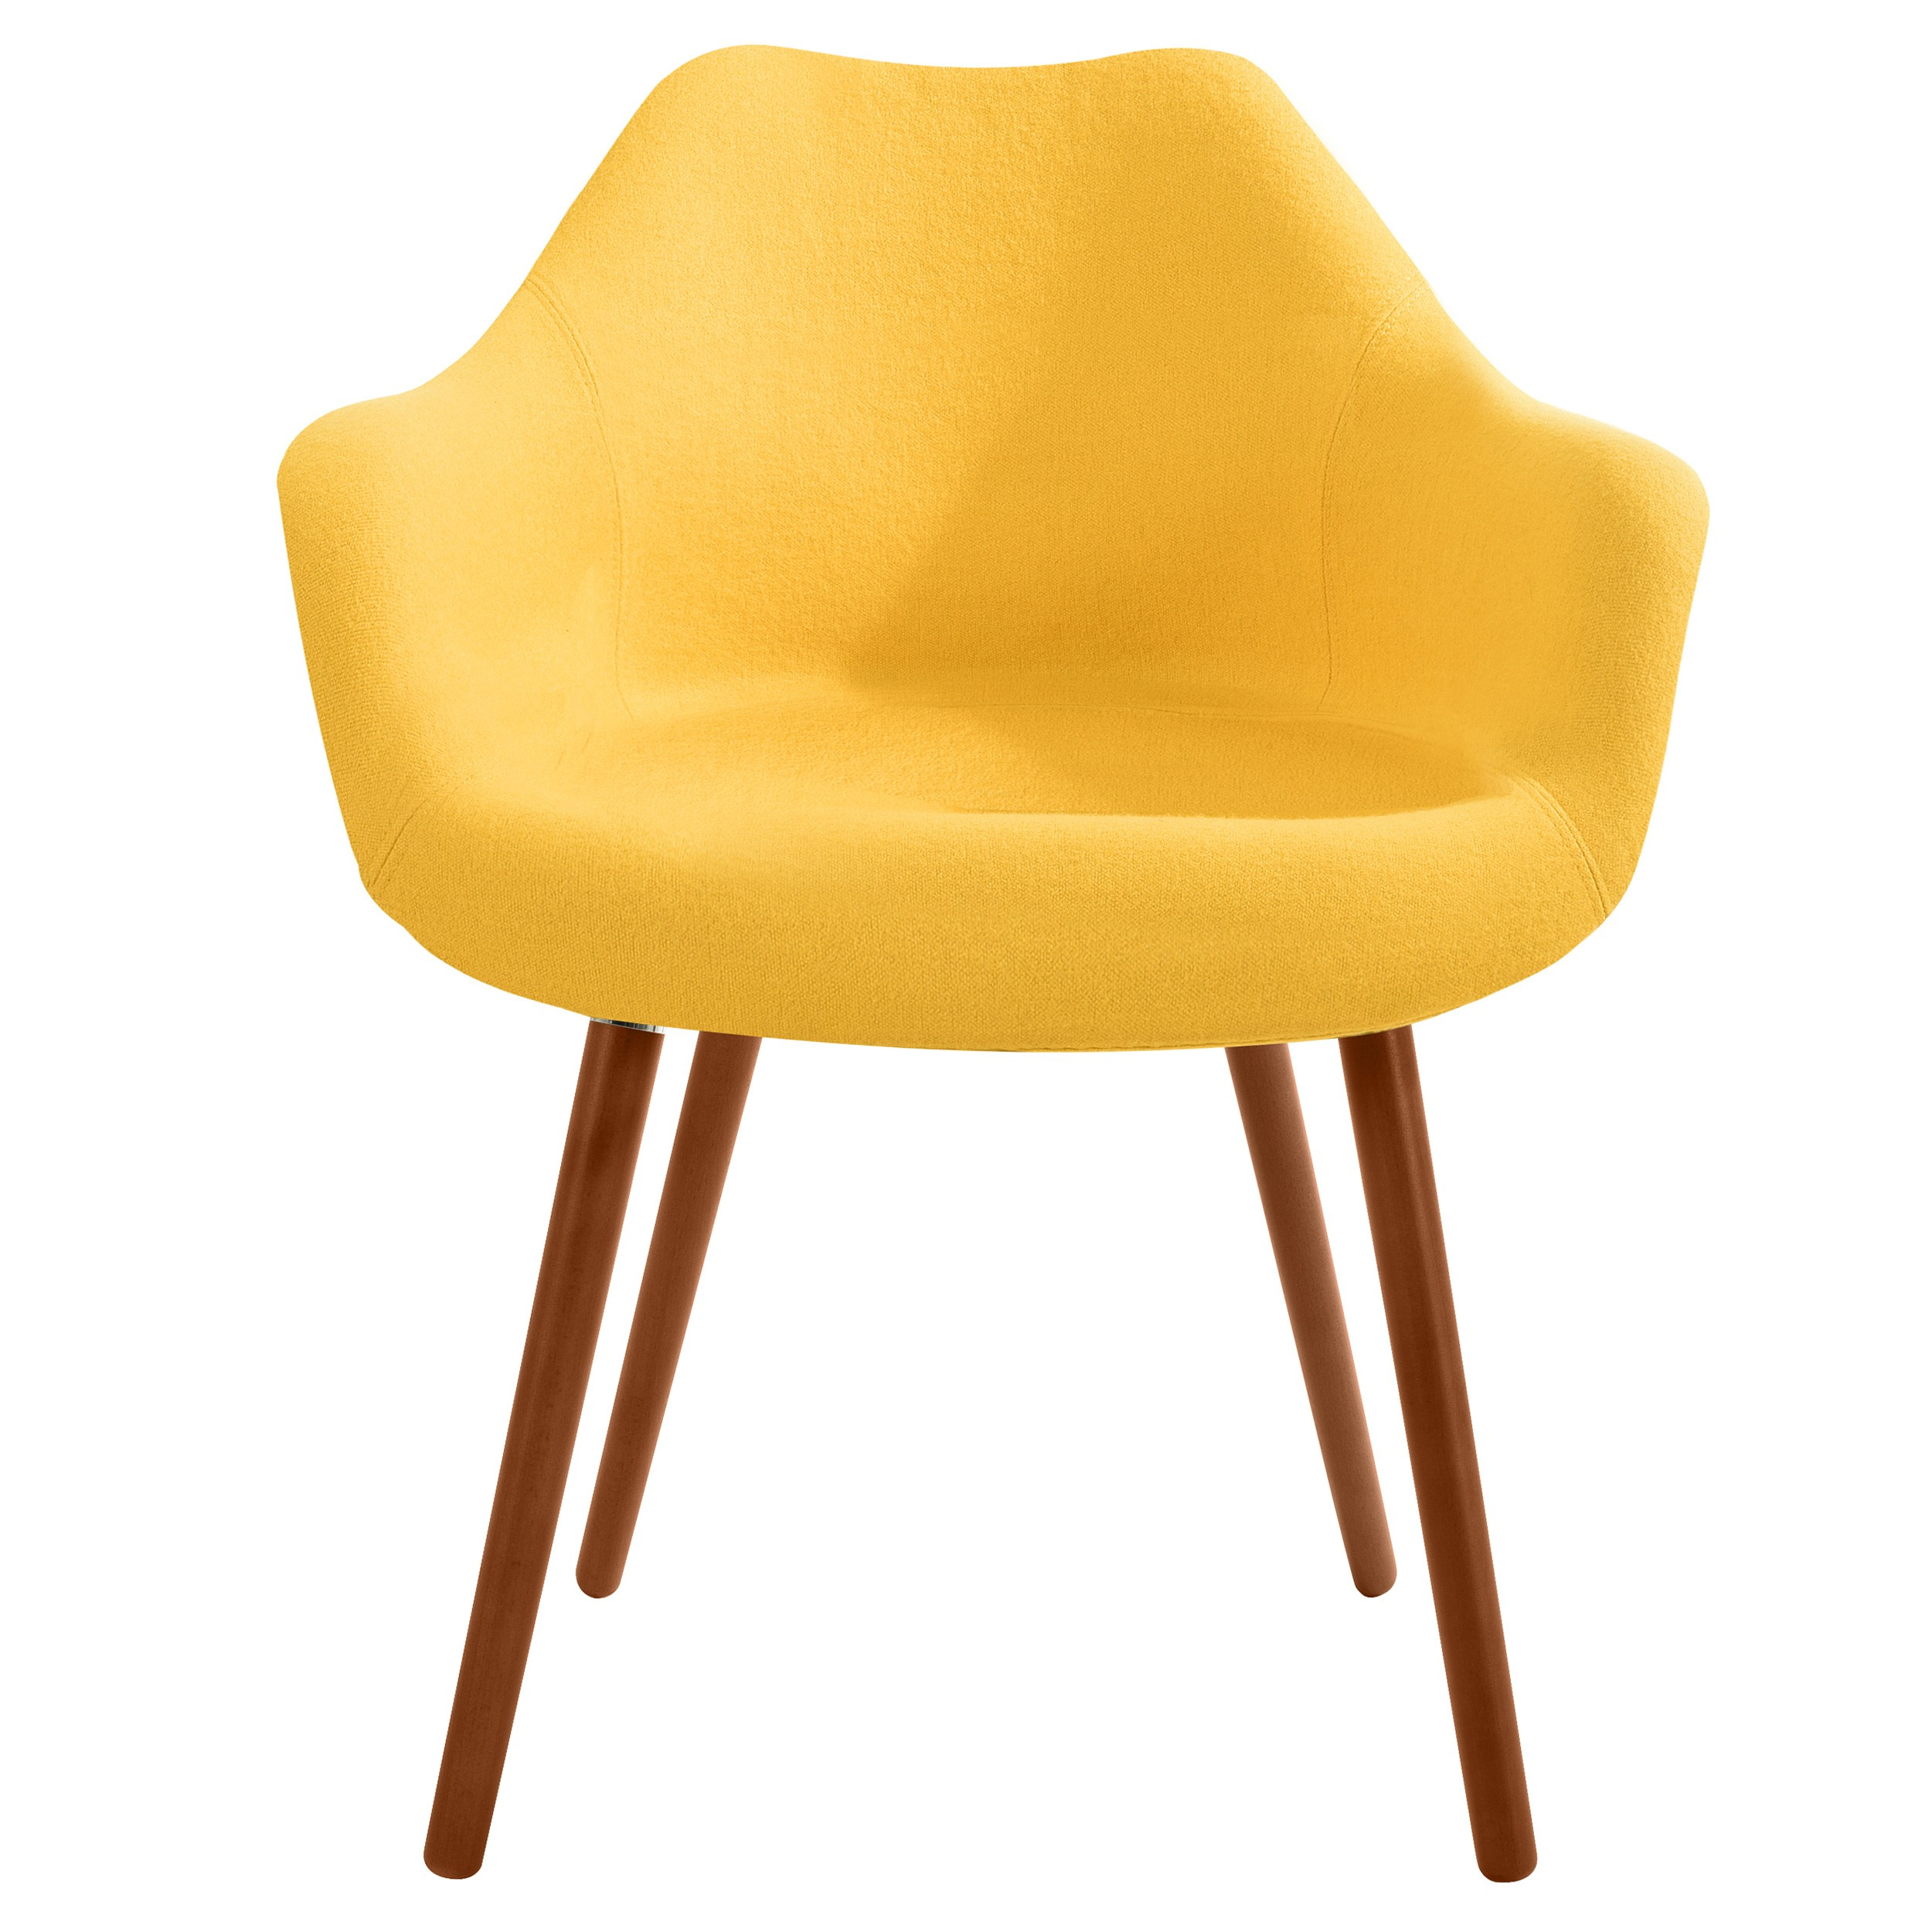 Chaise anssen jaune achetez nos chaises anssen jaunes for Chaise jaune design